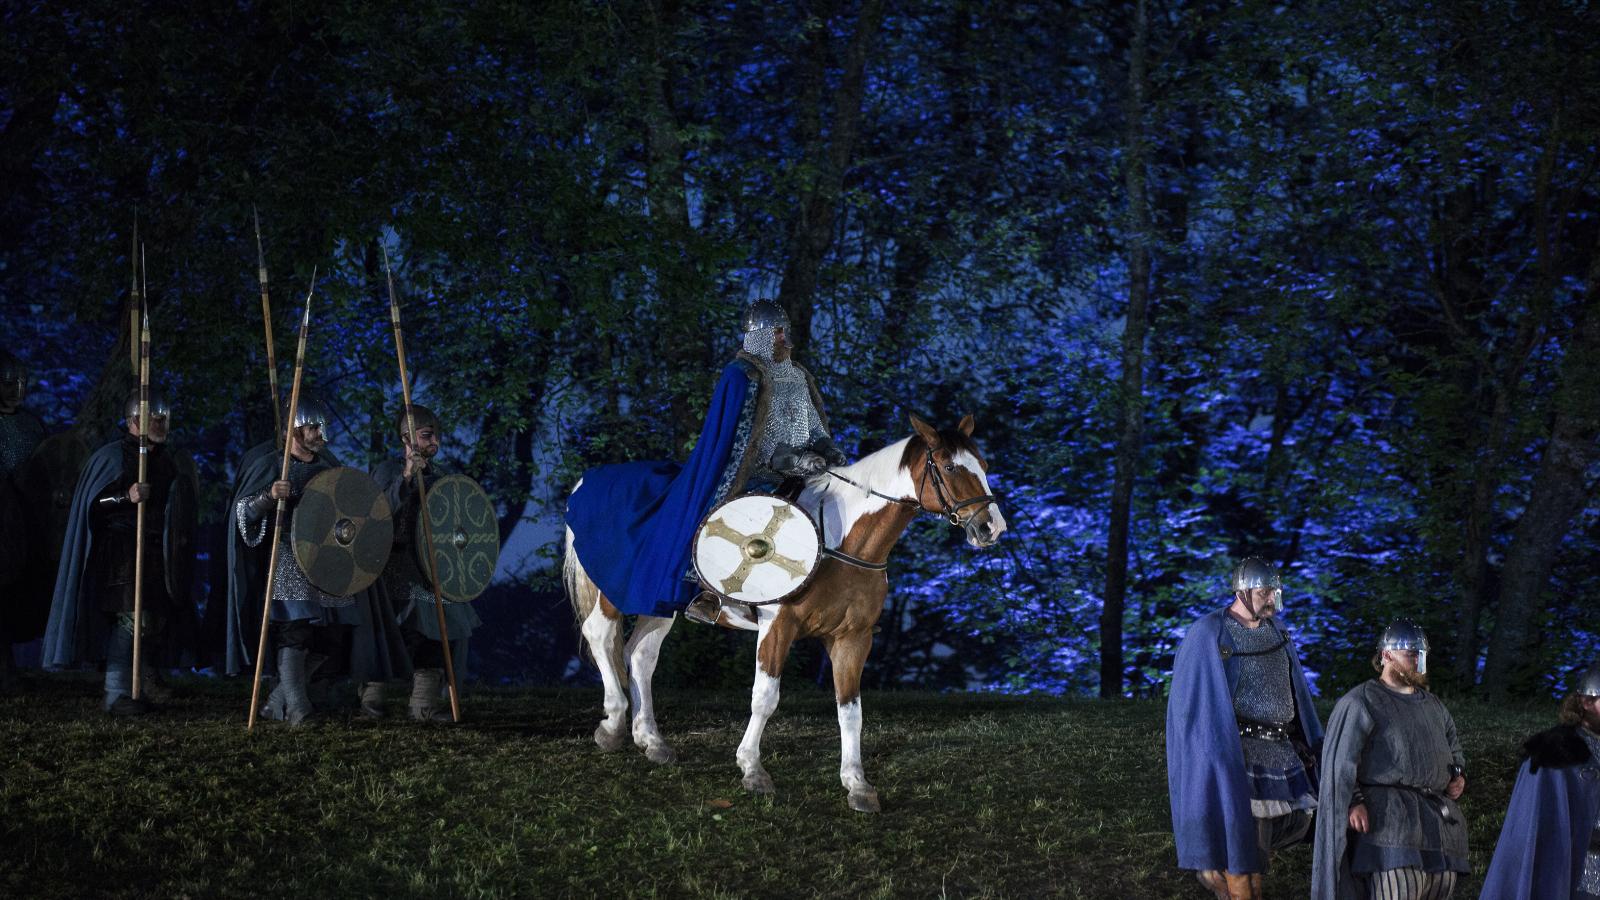 Spelet om Heilag Olav på Stiklestad, Trøndelag. Foto: SNK